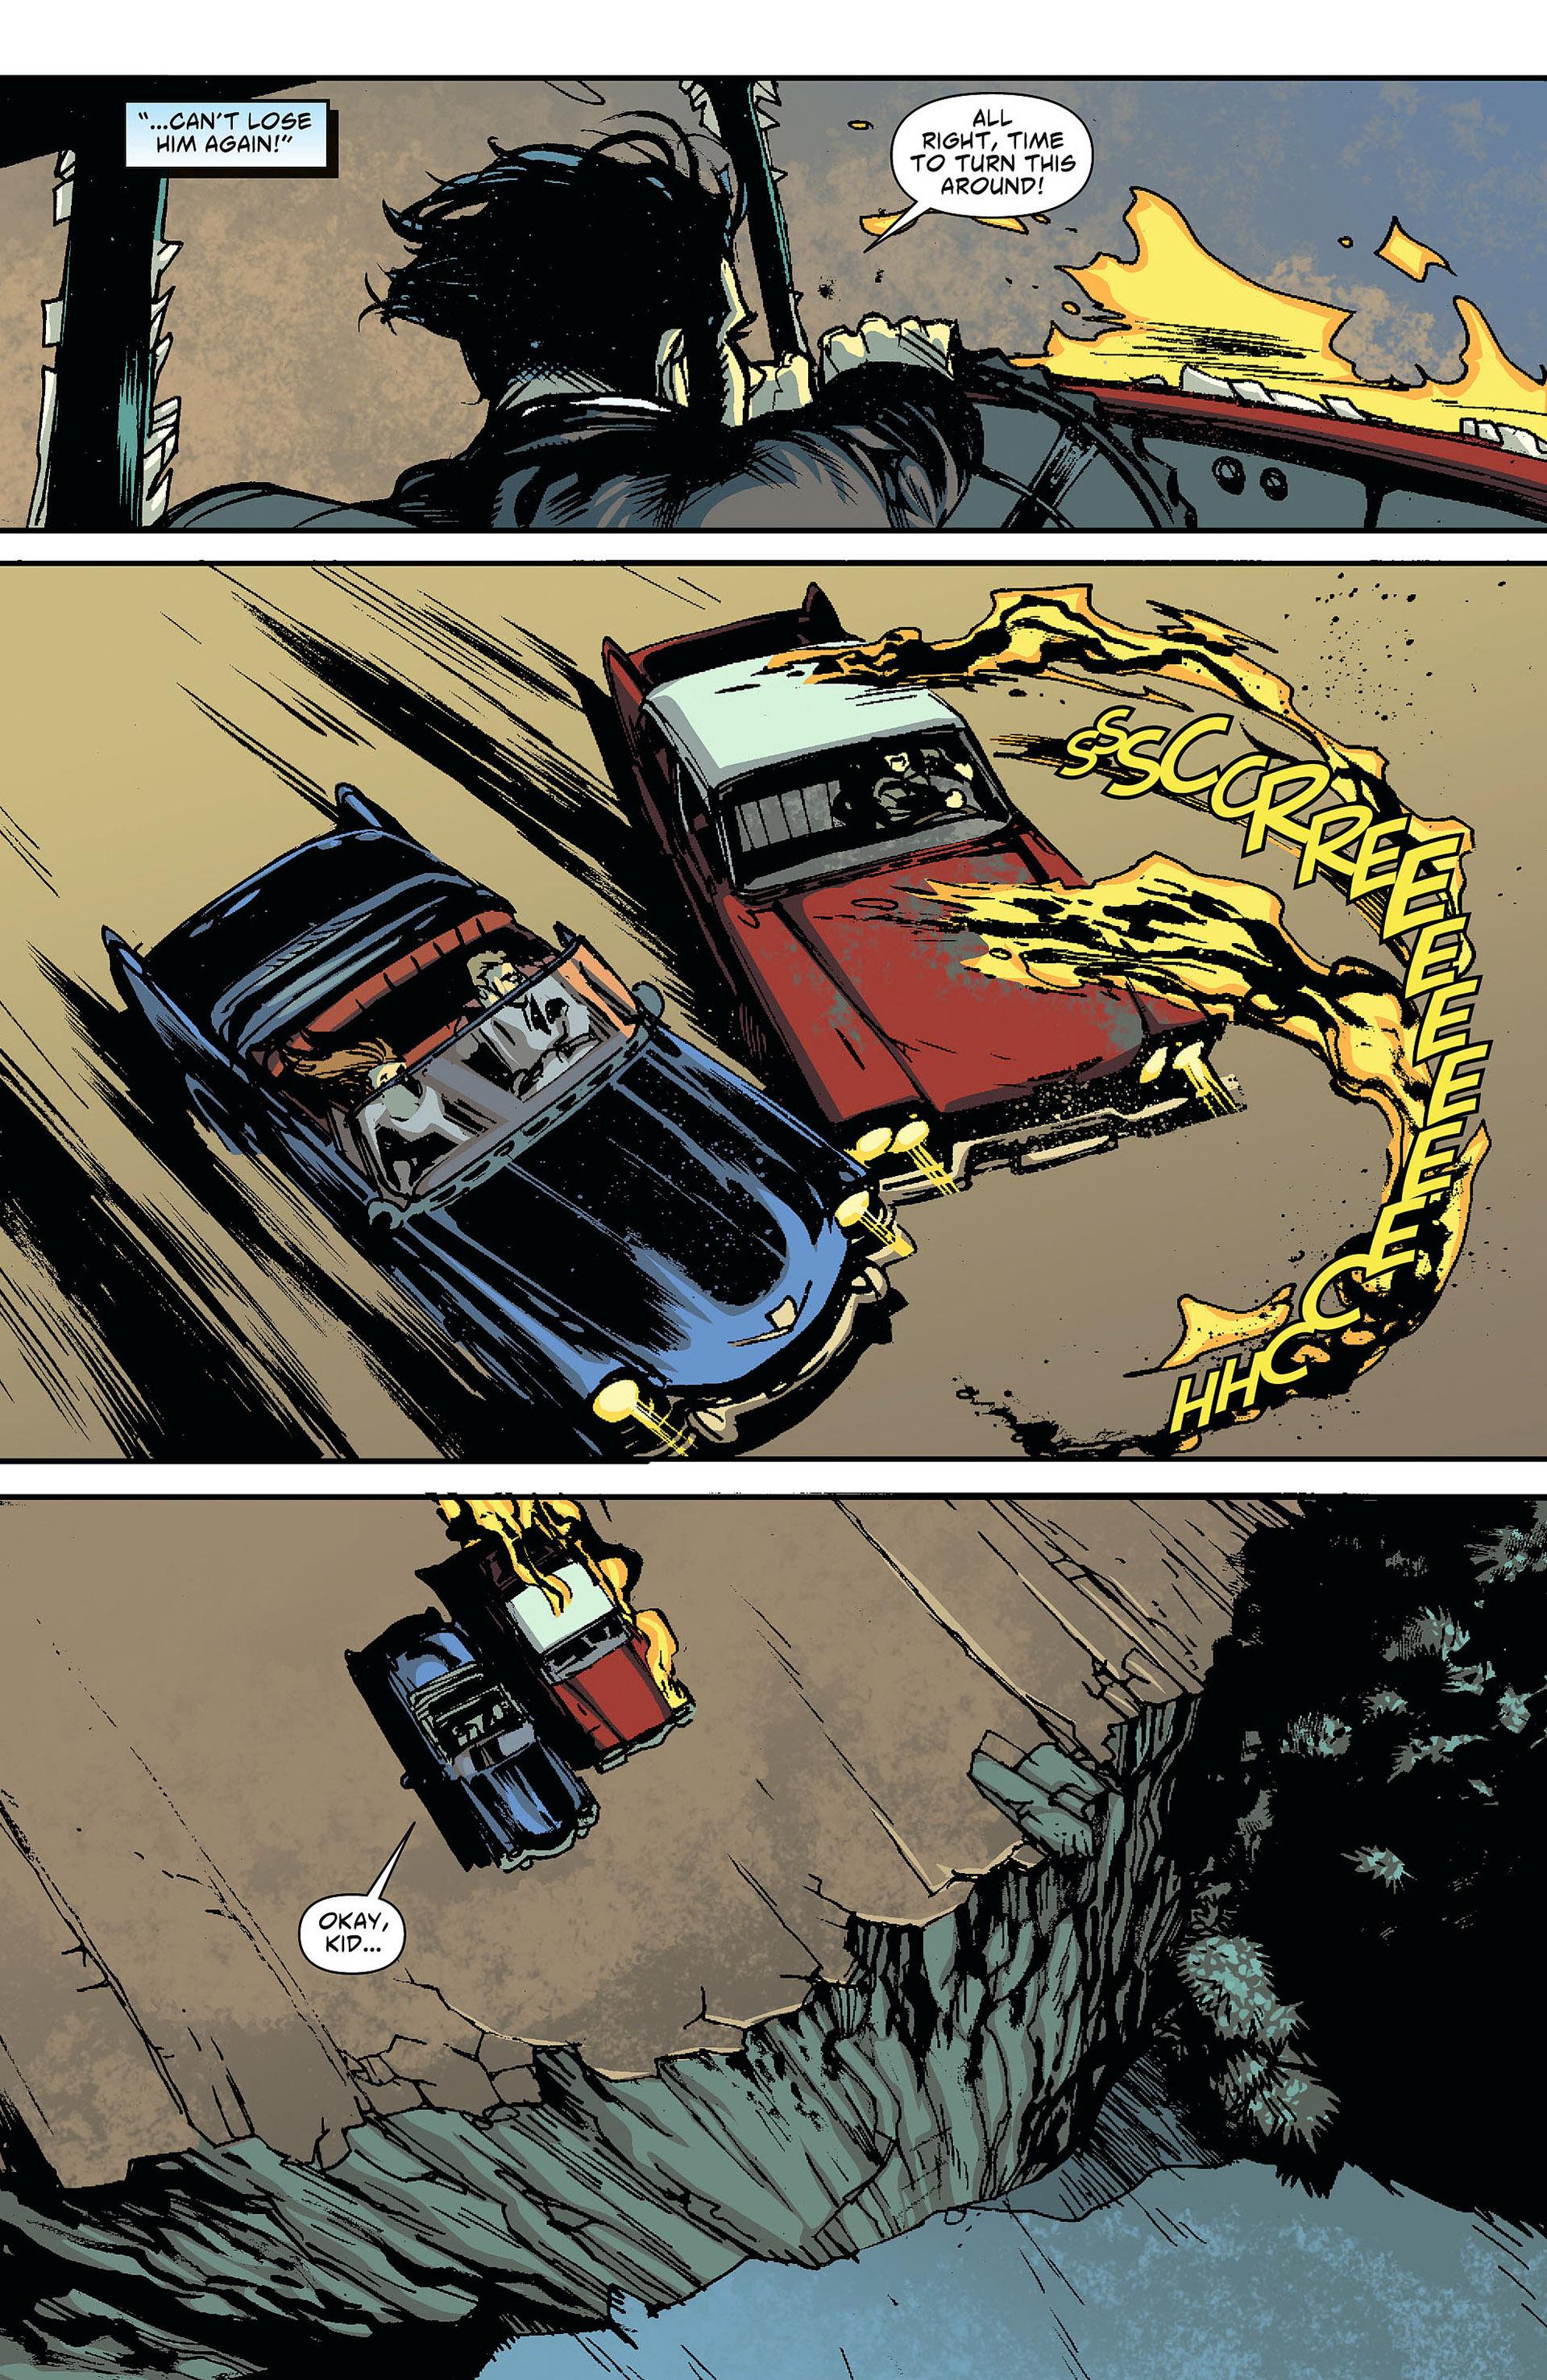 Read online American Vampire comic -  Issue #24 - 11